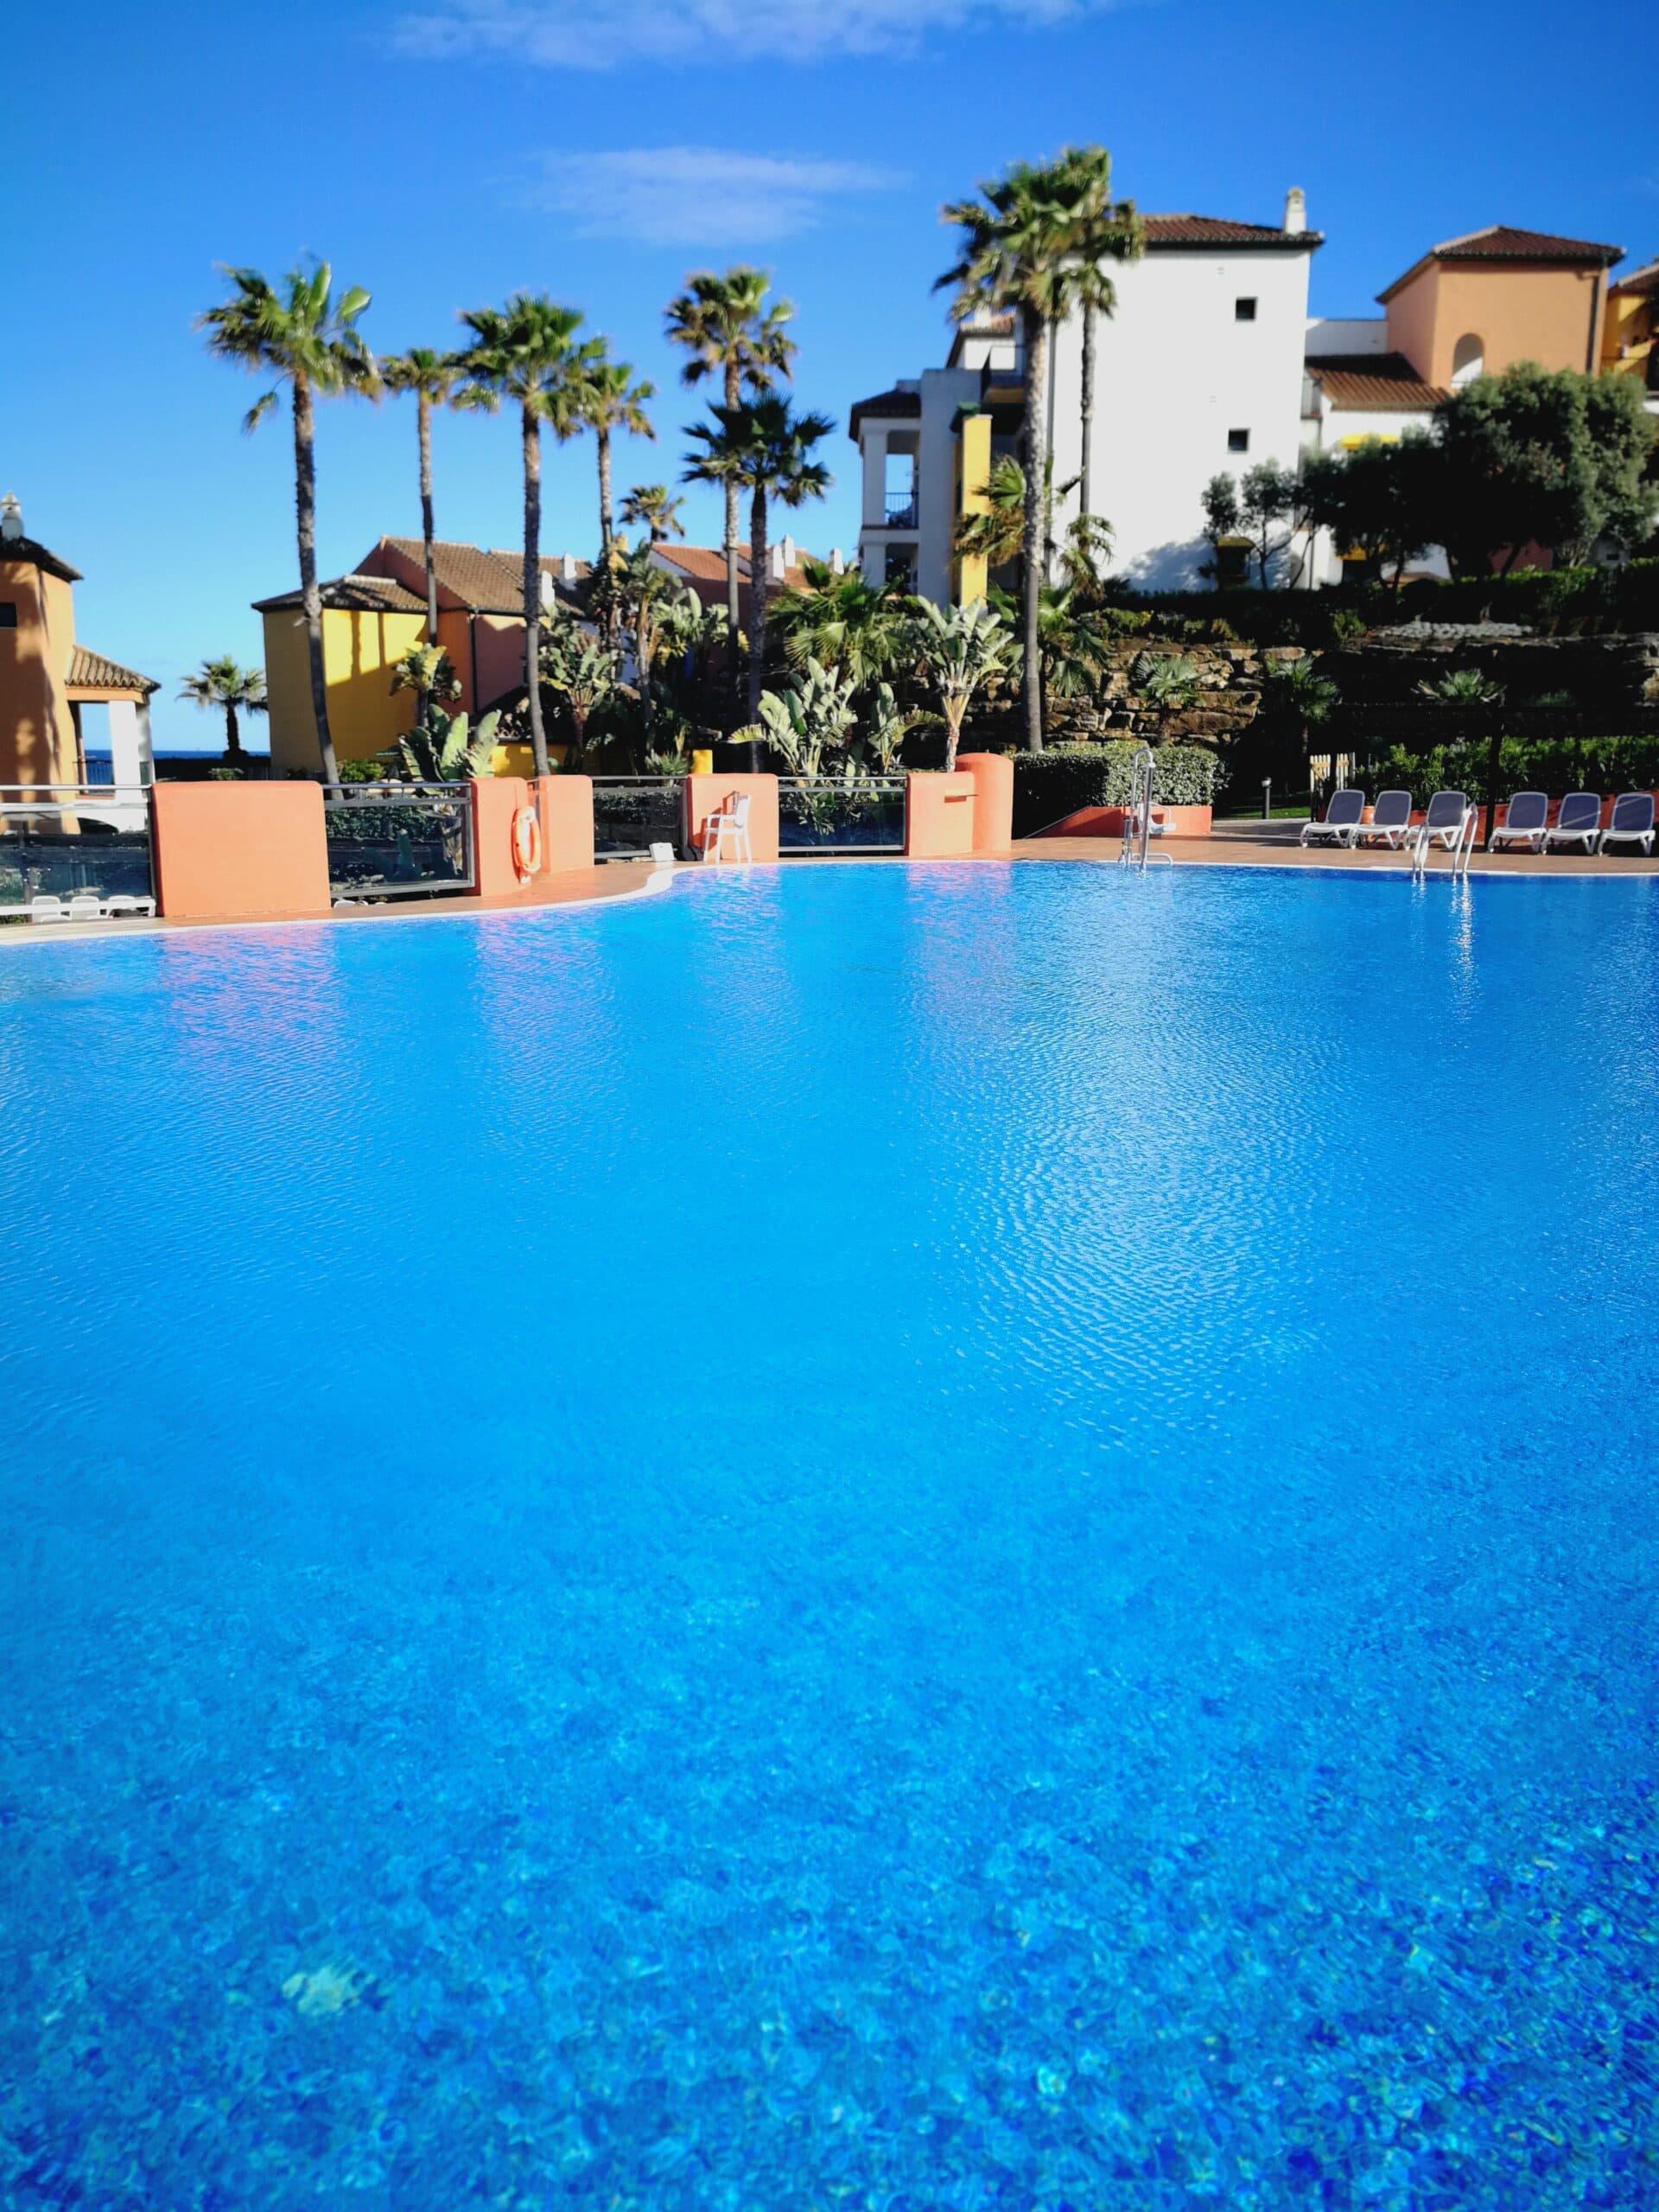 Strandclub Aldiana Club Resort Costa del Sol Pool Ozeanien Tours